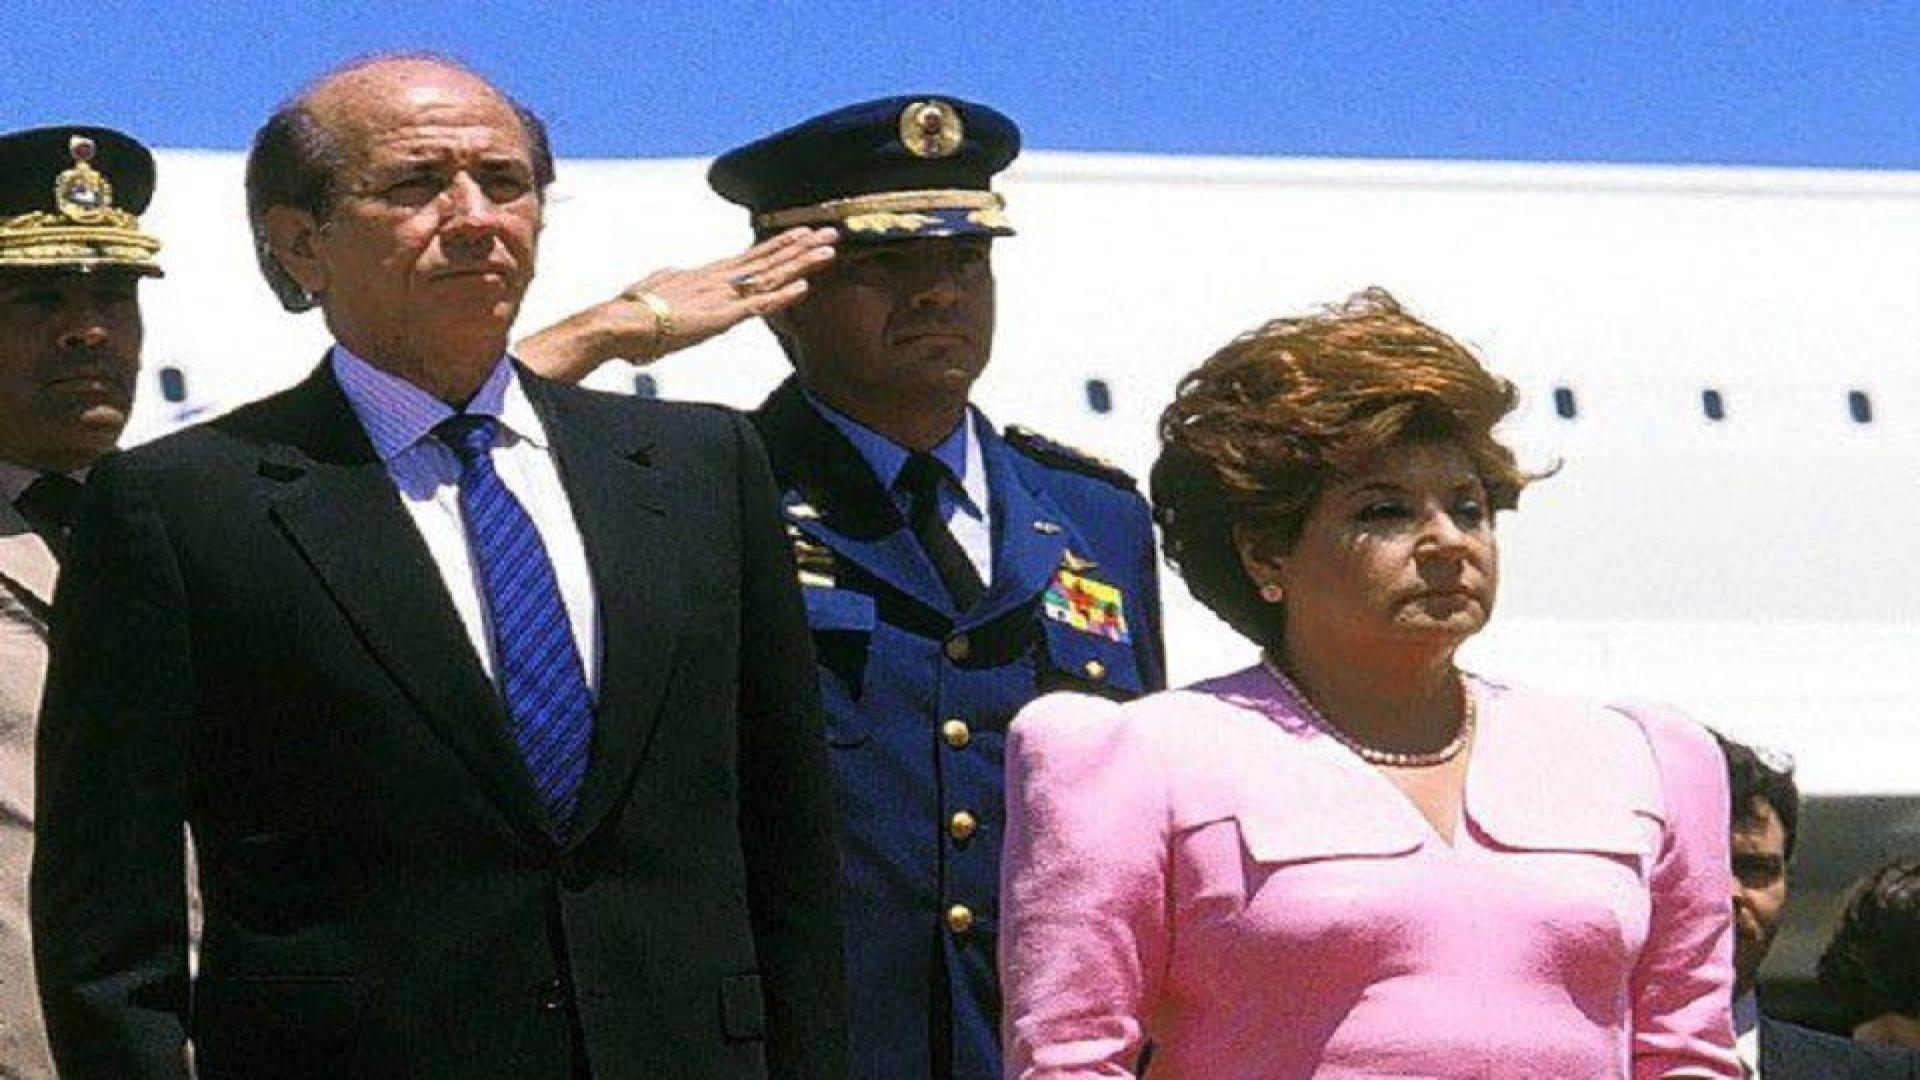 Murió en Caracas la ex primera dama Blanca Rodríguez de Pérez